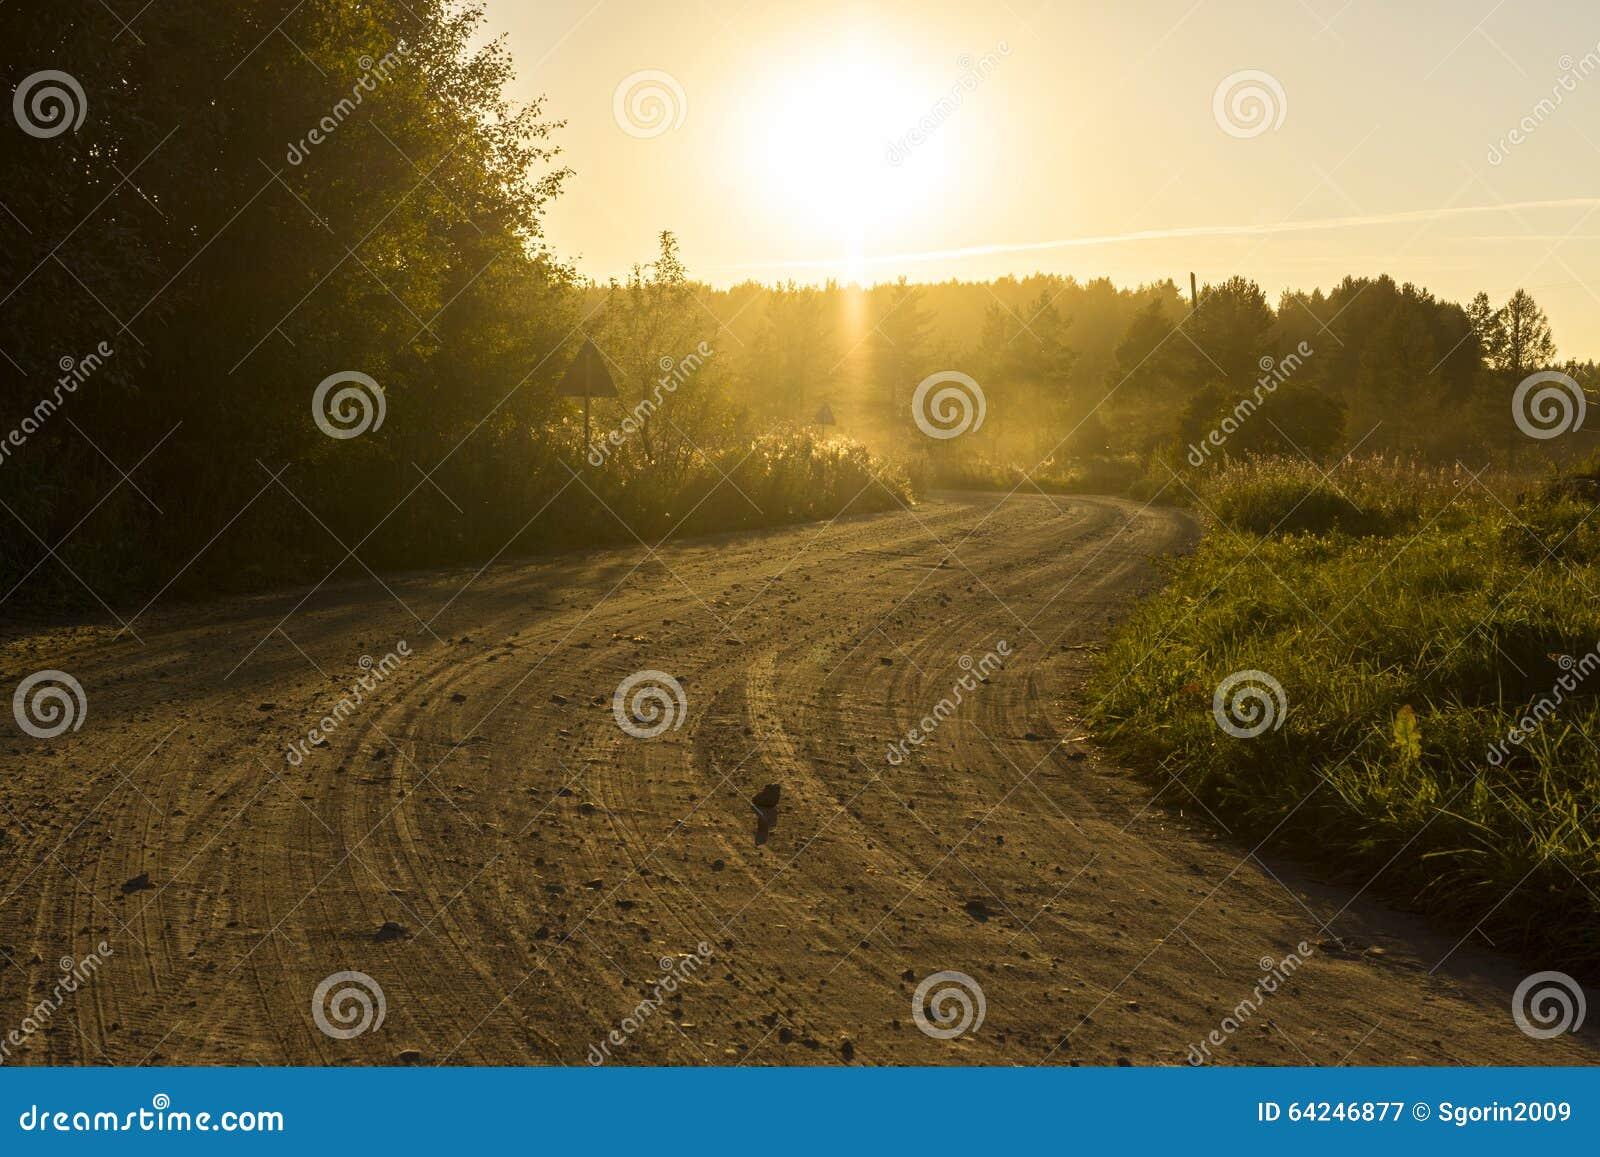 rural-dirt-road-sunset-dusty-64246877.jp